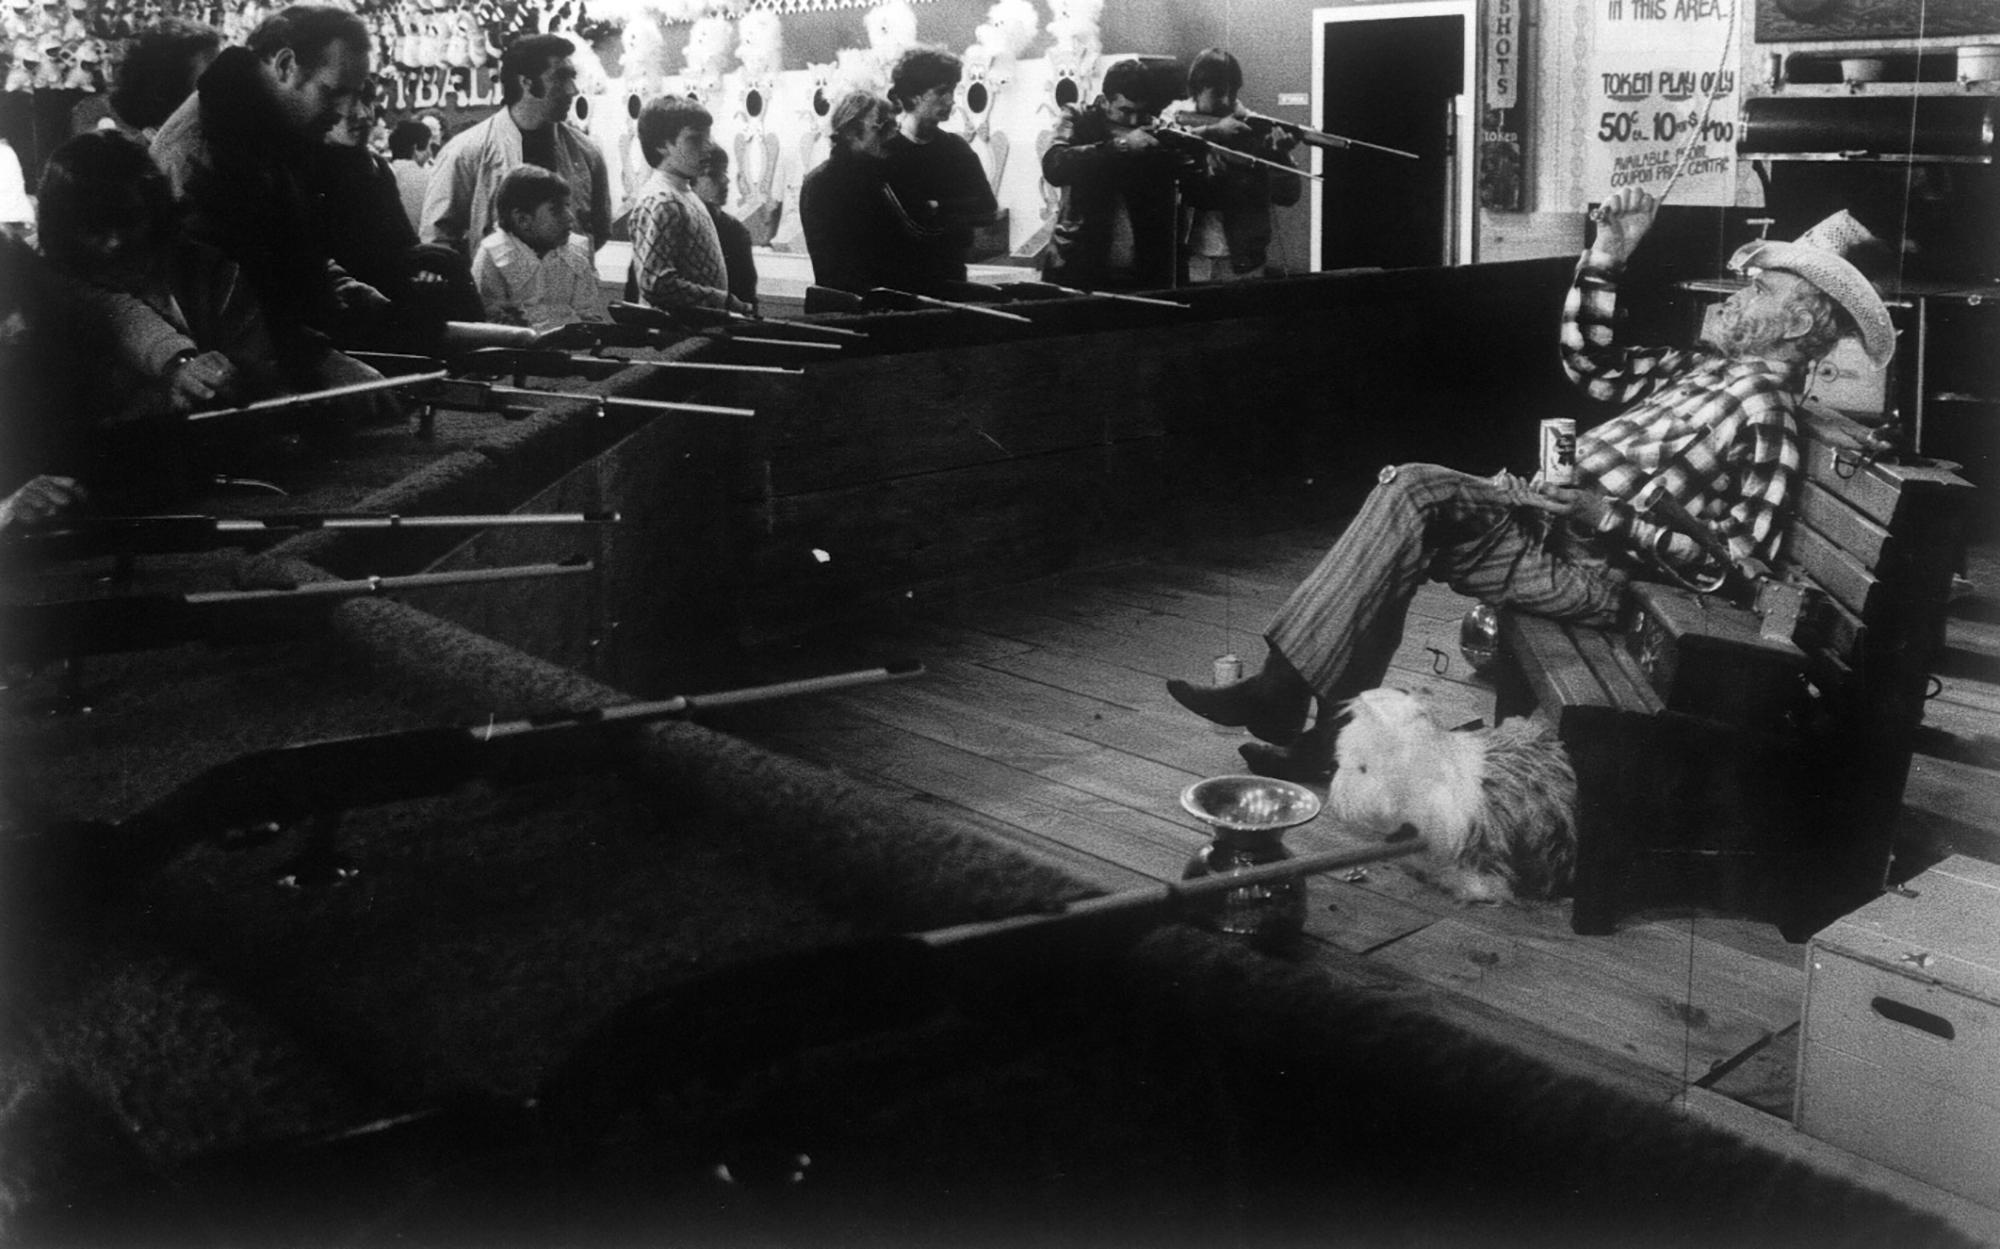 LUNA PARK / MELBOURNE 1978